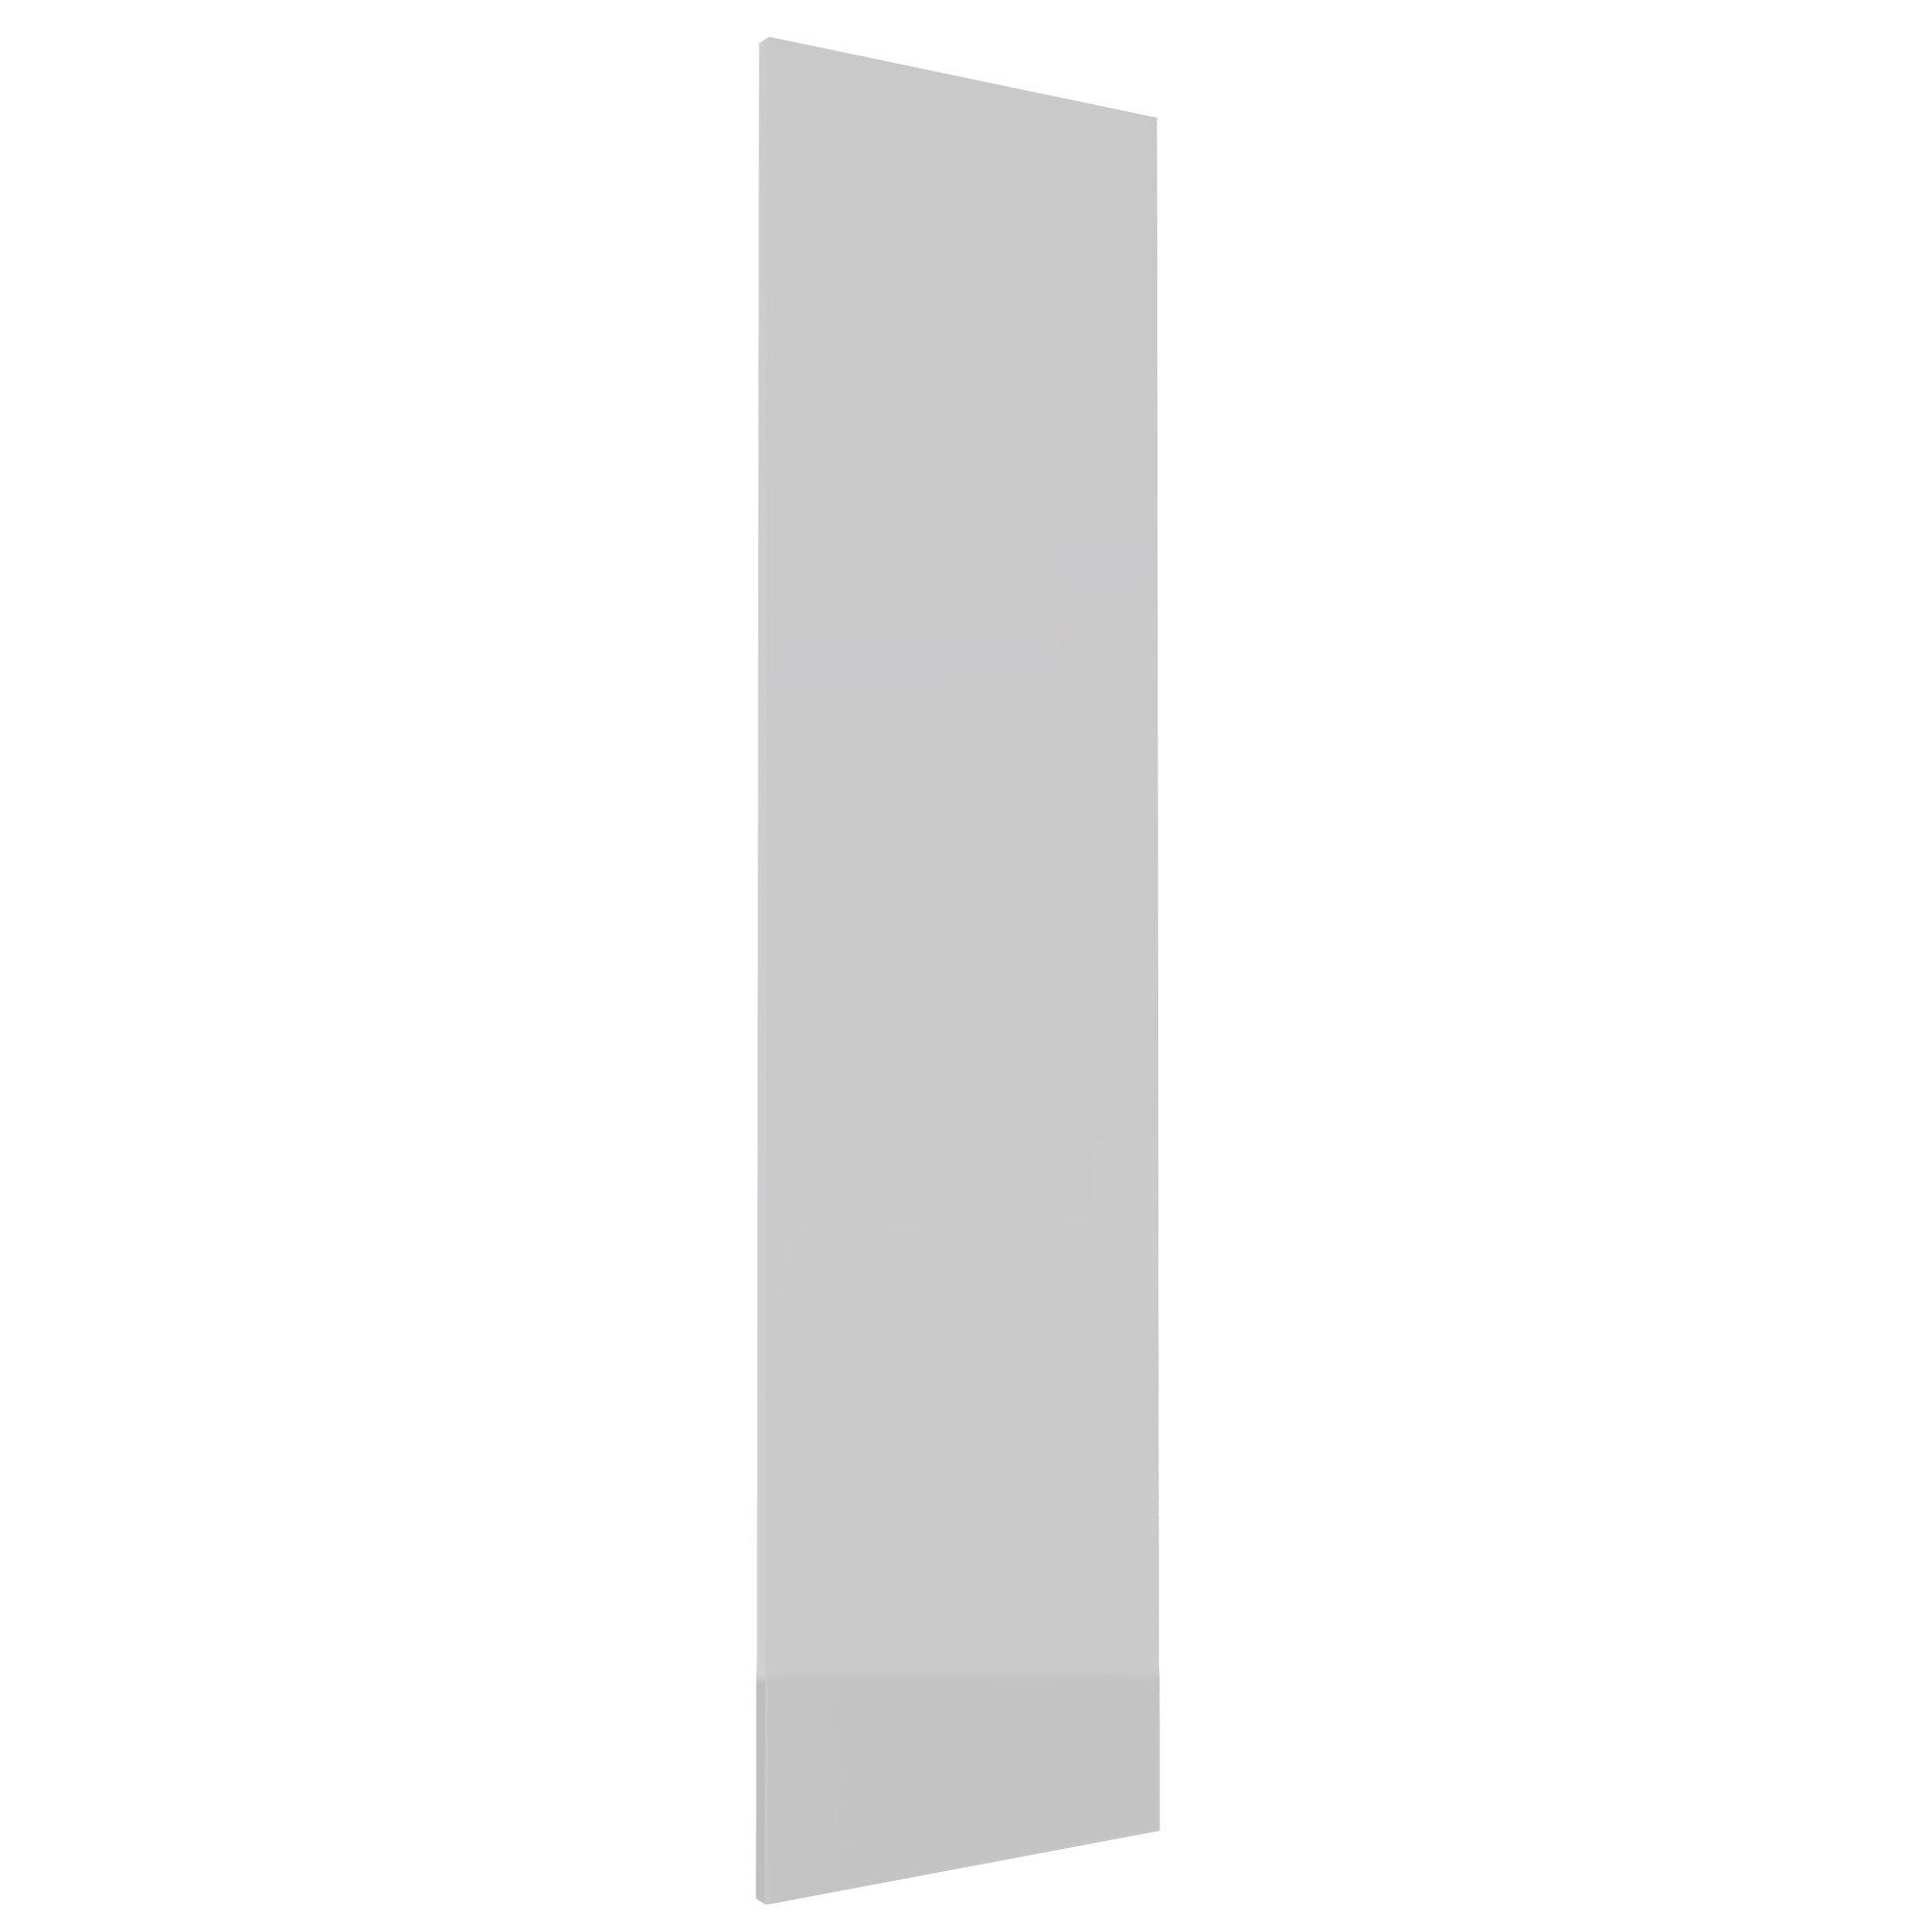 Darwin Modular White & Gloss Wardrobe Door (h)1456mm (w)372mm (d)18mm